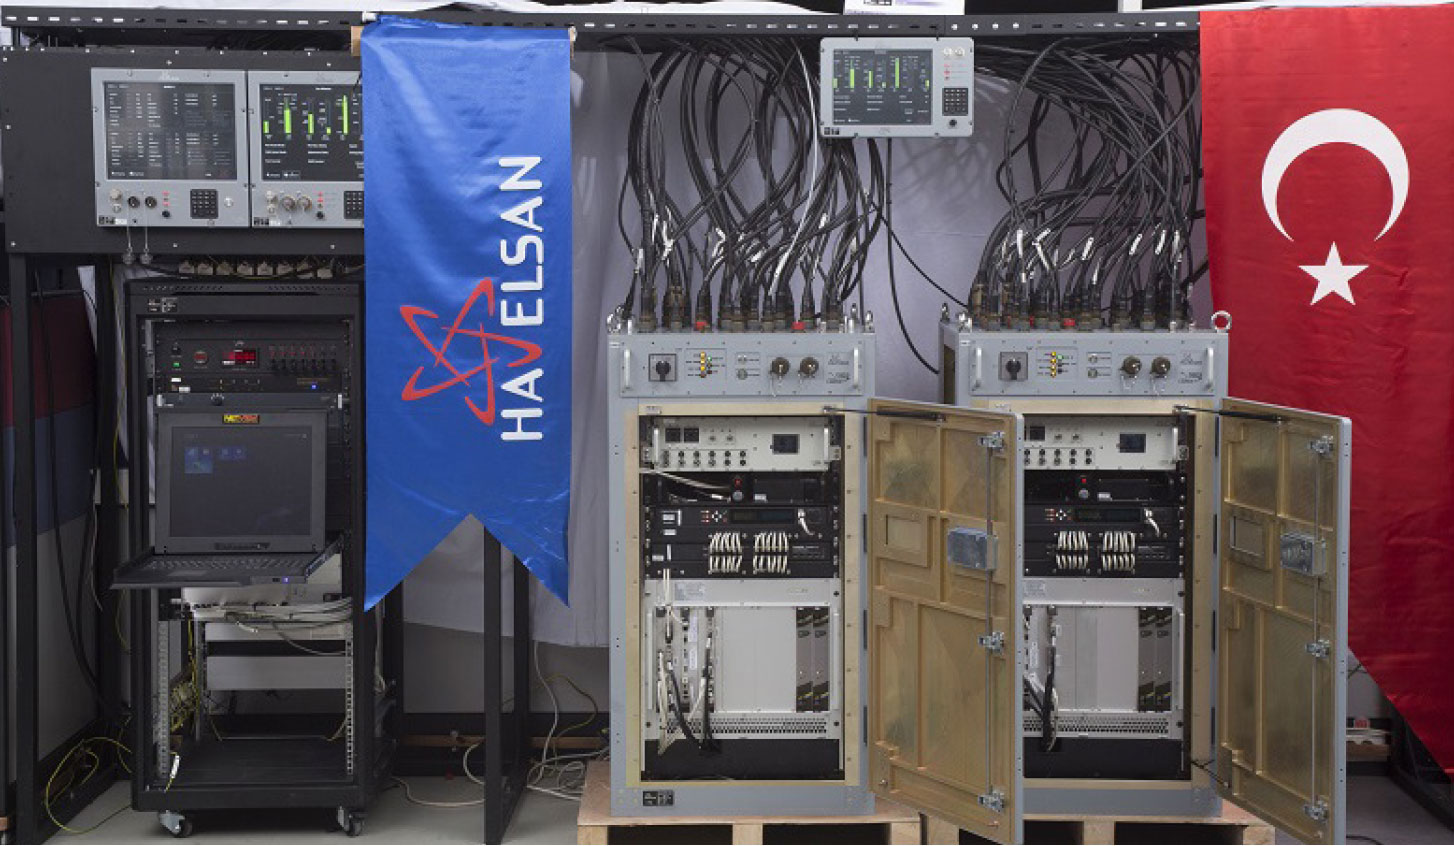 selman reis submarine information distribution system in test phase savunmahaber com